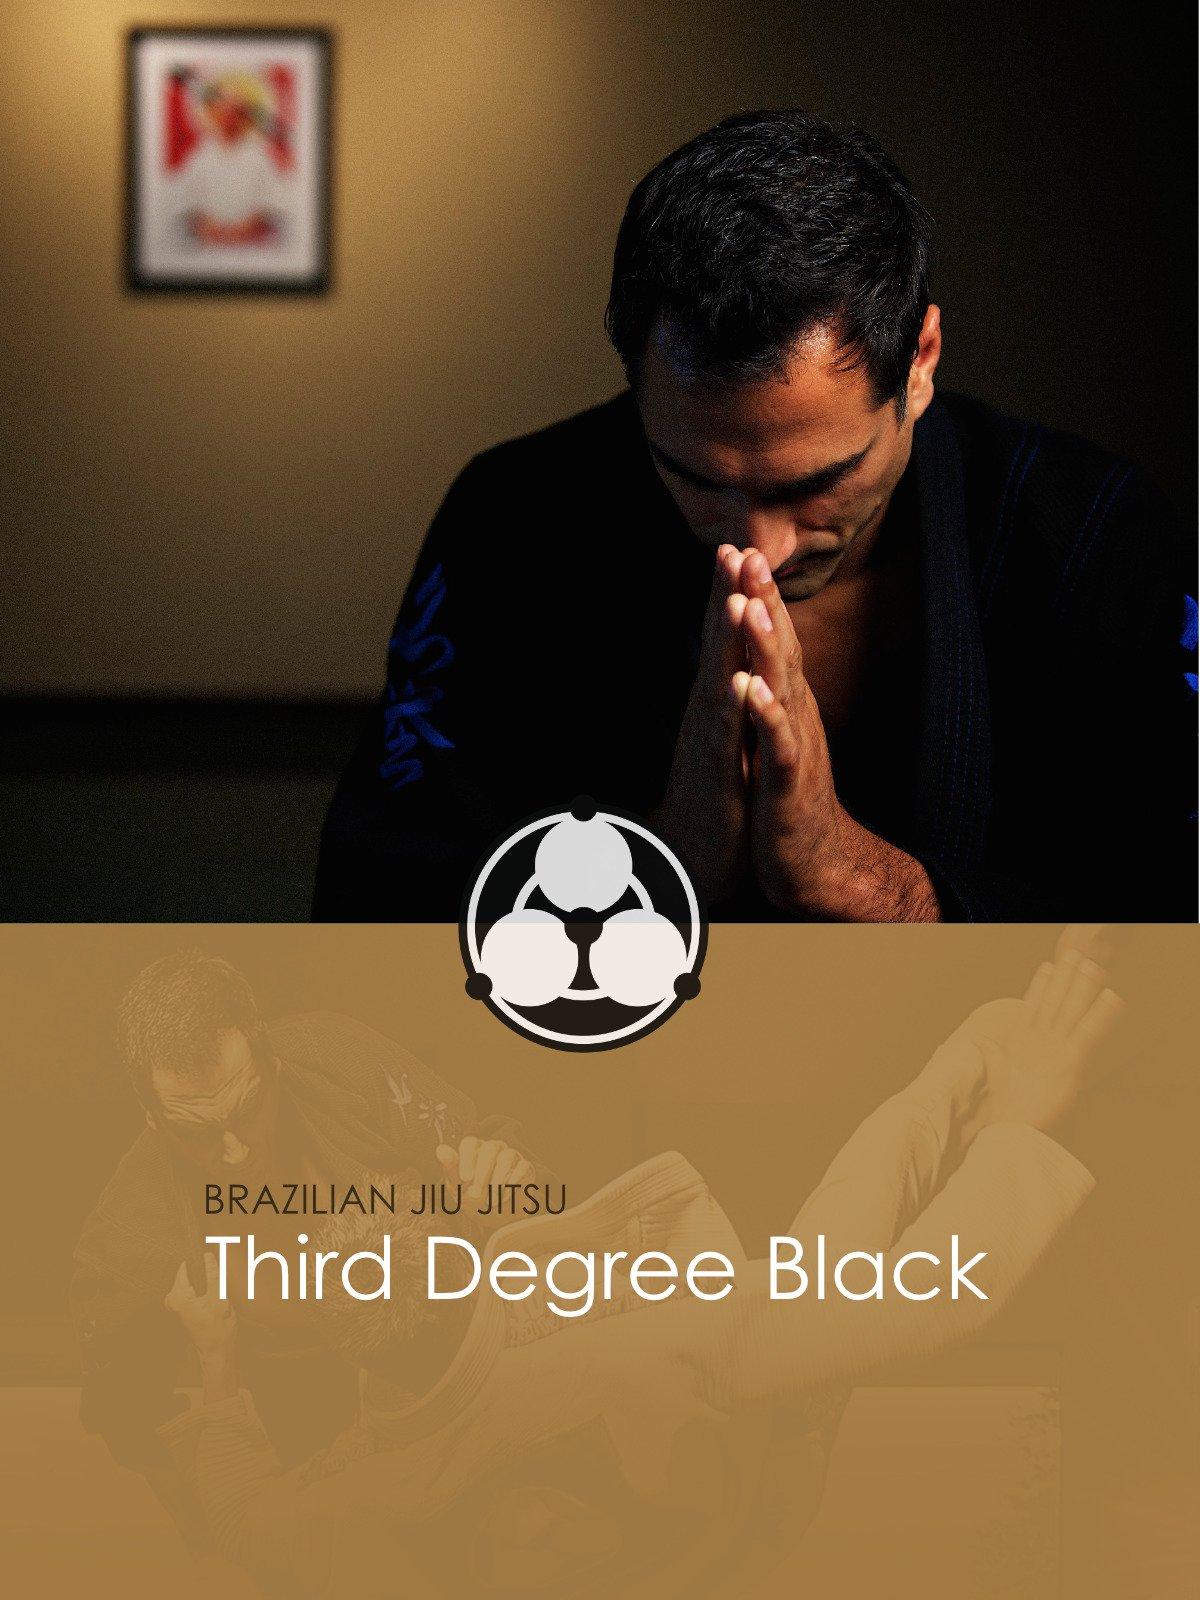 Brazilian Jiu Jitsu: Third Degree Black on Amazon Prime Video UK